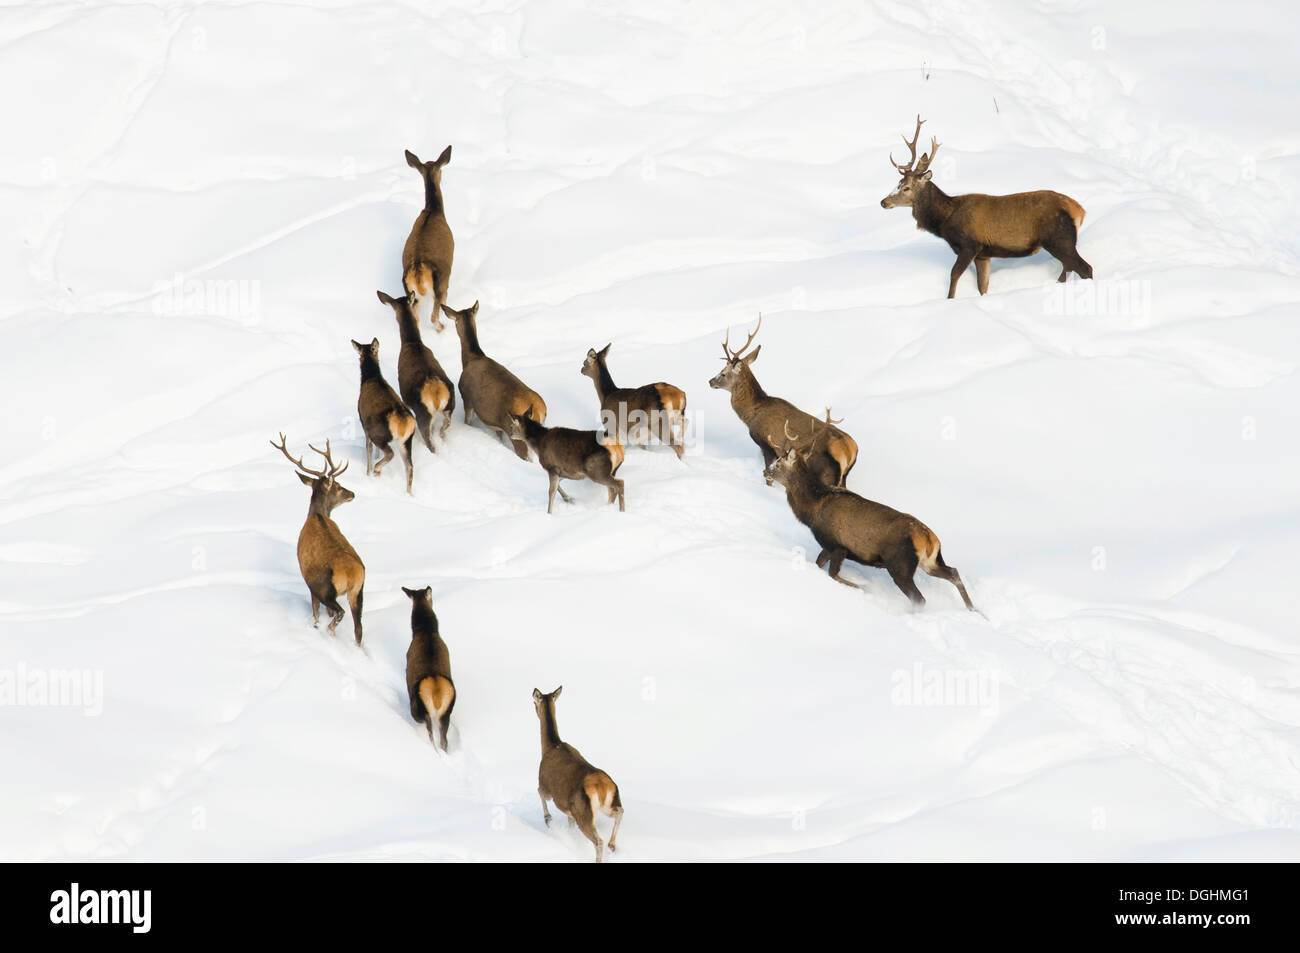 Red deer (Cervus elaphus) on a snow-covered steep slope, High Alpine Nature Park of the Zillertal Alps, Tyrol, Austria, Stock Photo